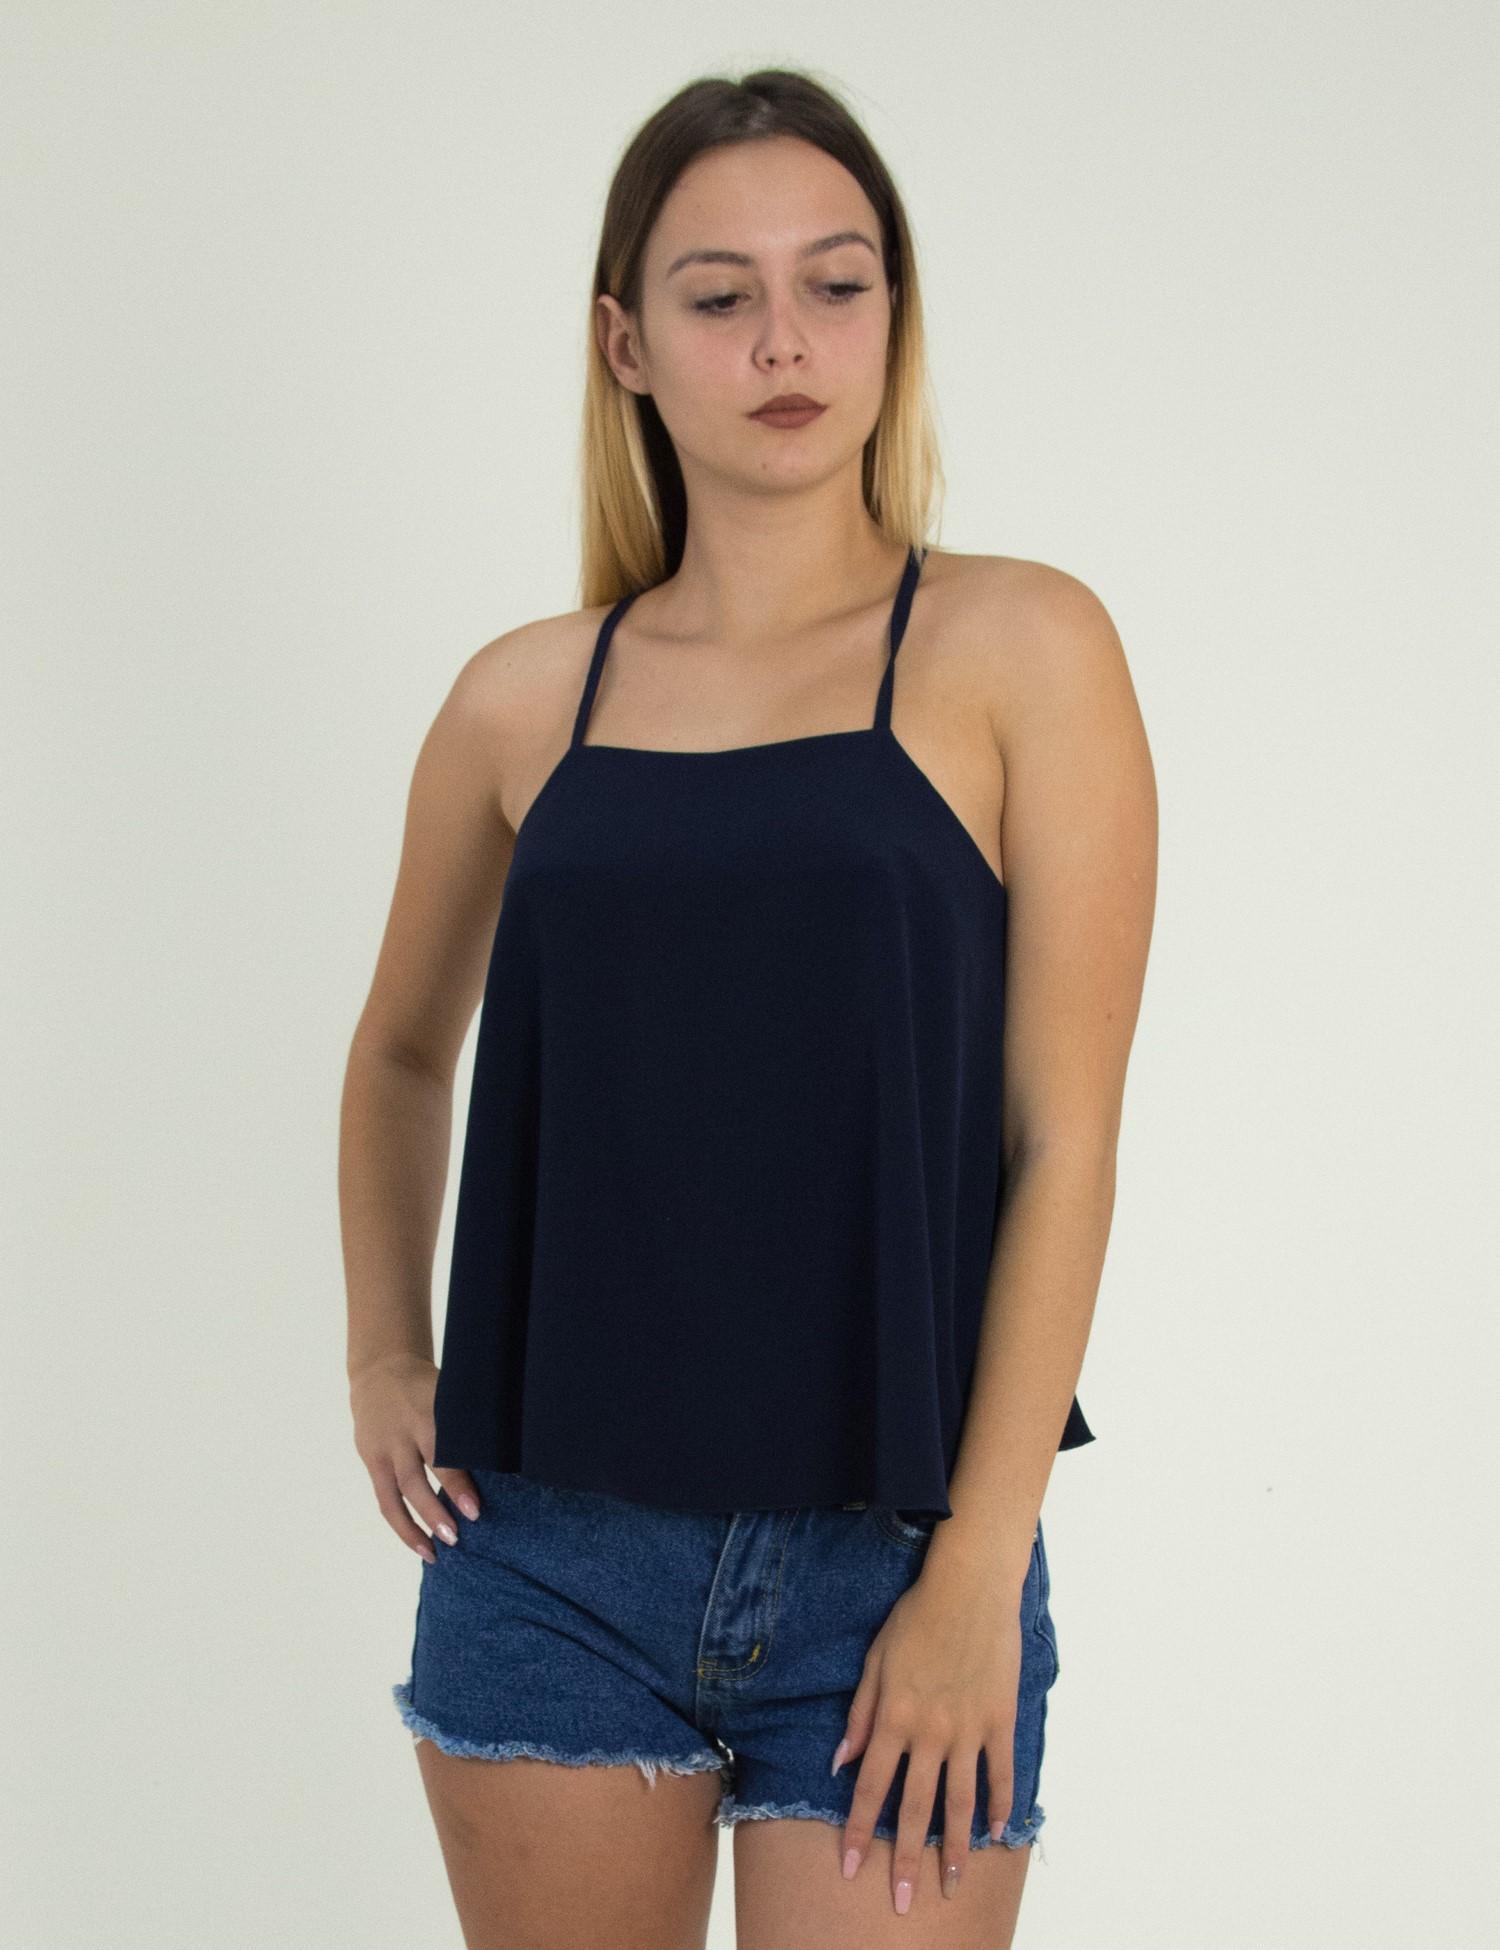 da31e82fbec0 Γυναικεία μπλε μπλούζα με ράντες μονόχρωμη άνοιγμα 1180155R